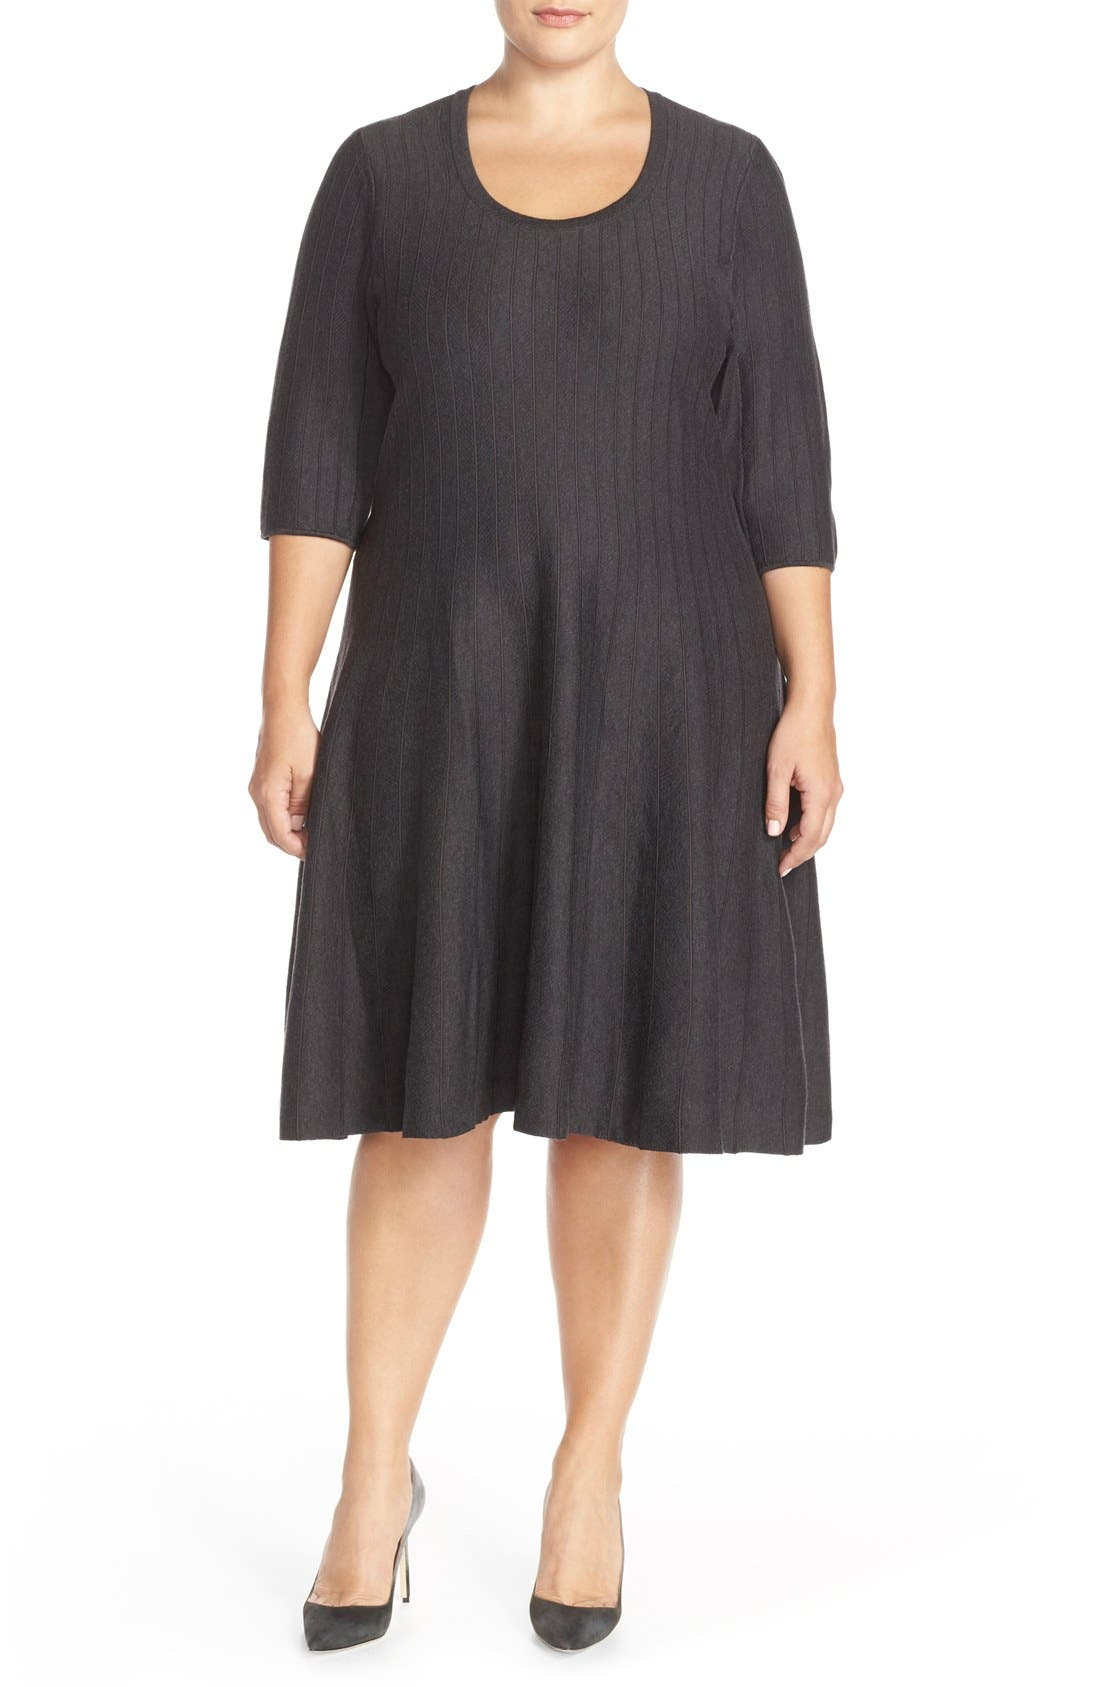 NIC+ZOE 'Twirl' Elbow Sleeve Knit Fit & Flare Dress (Plus Size)